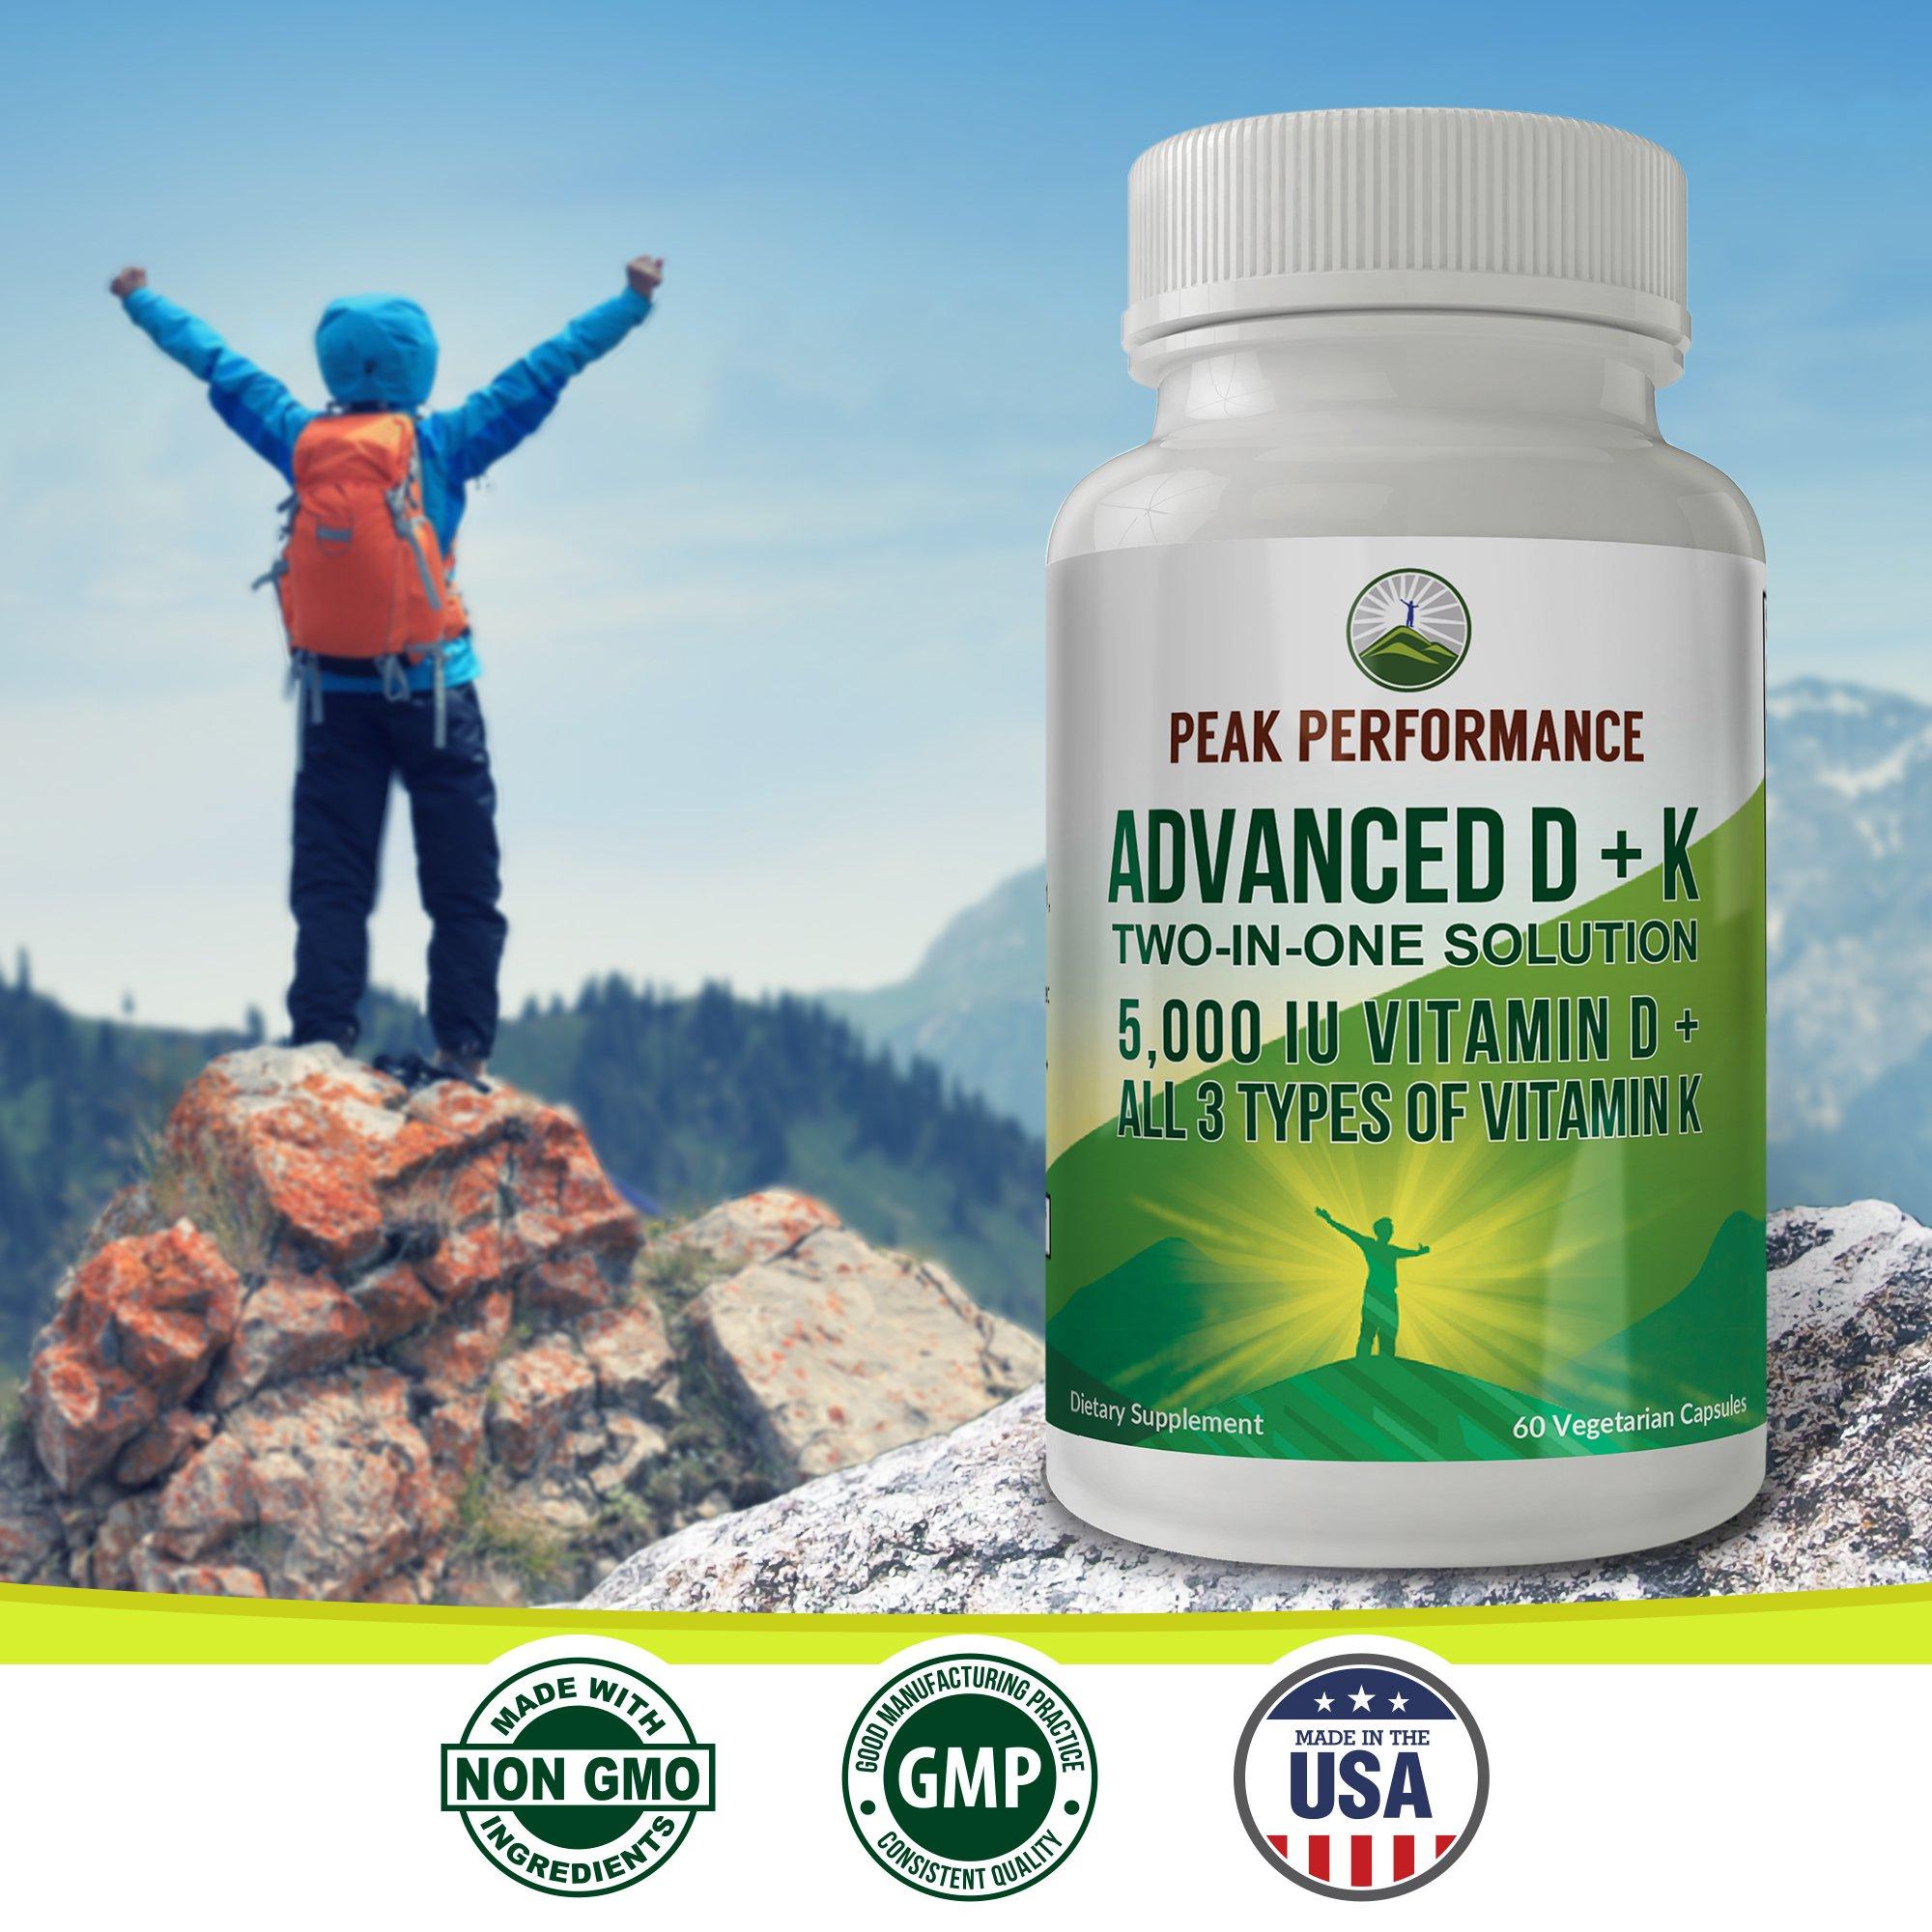 ADVANCED Vitamin D 5000 IU + ALL 3 Types Of Vitamin K By Peak Performance. Vitamin D3 and Vitamin K2 MK-7 (MK7) K2 MK4 K1 Supplement! 60 Small & Easy to Swallow Vegetable Capsules / Pills (5000 IU) by Peak Performance Coffee (Image #5)